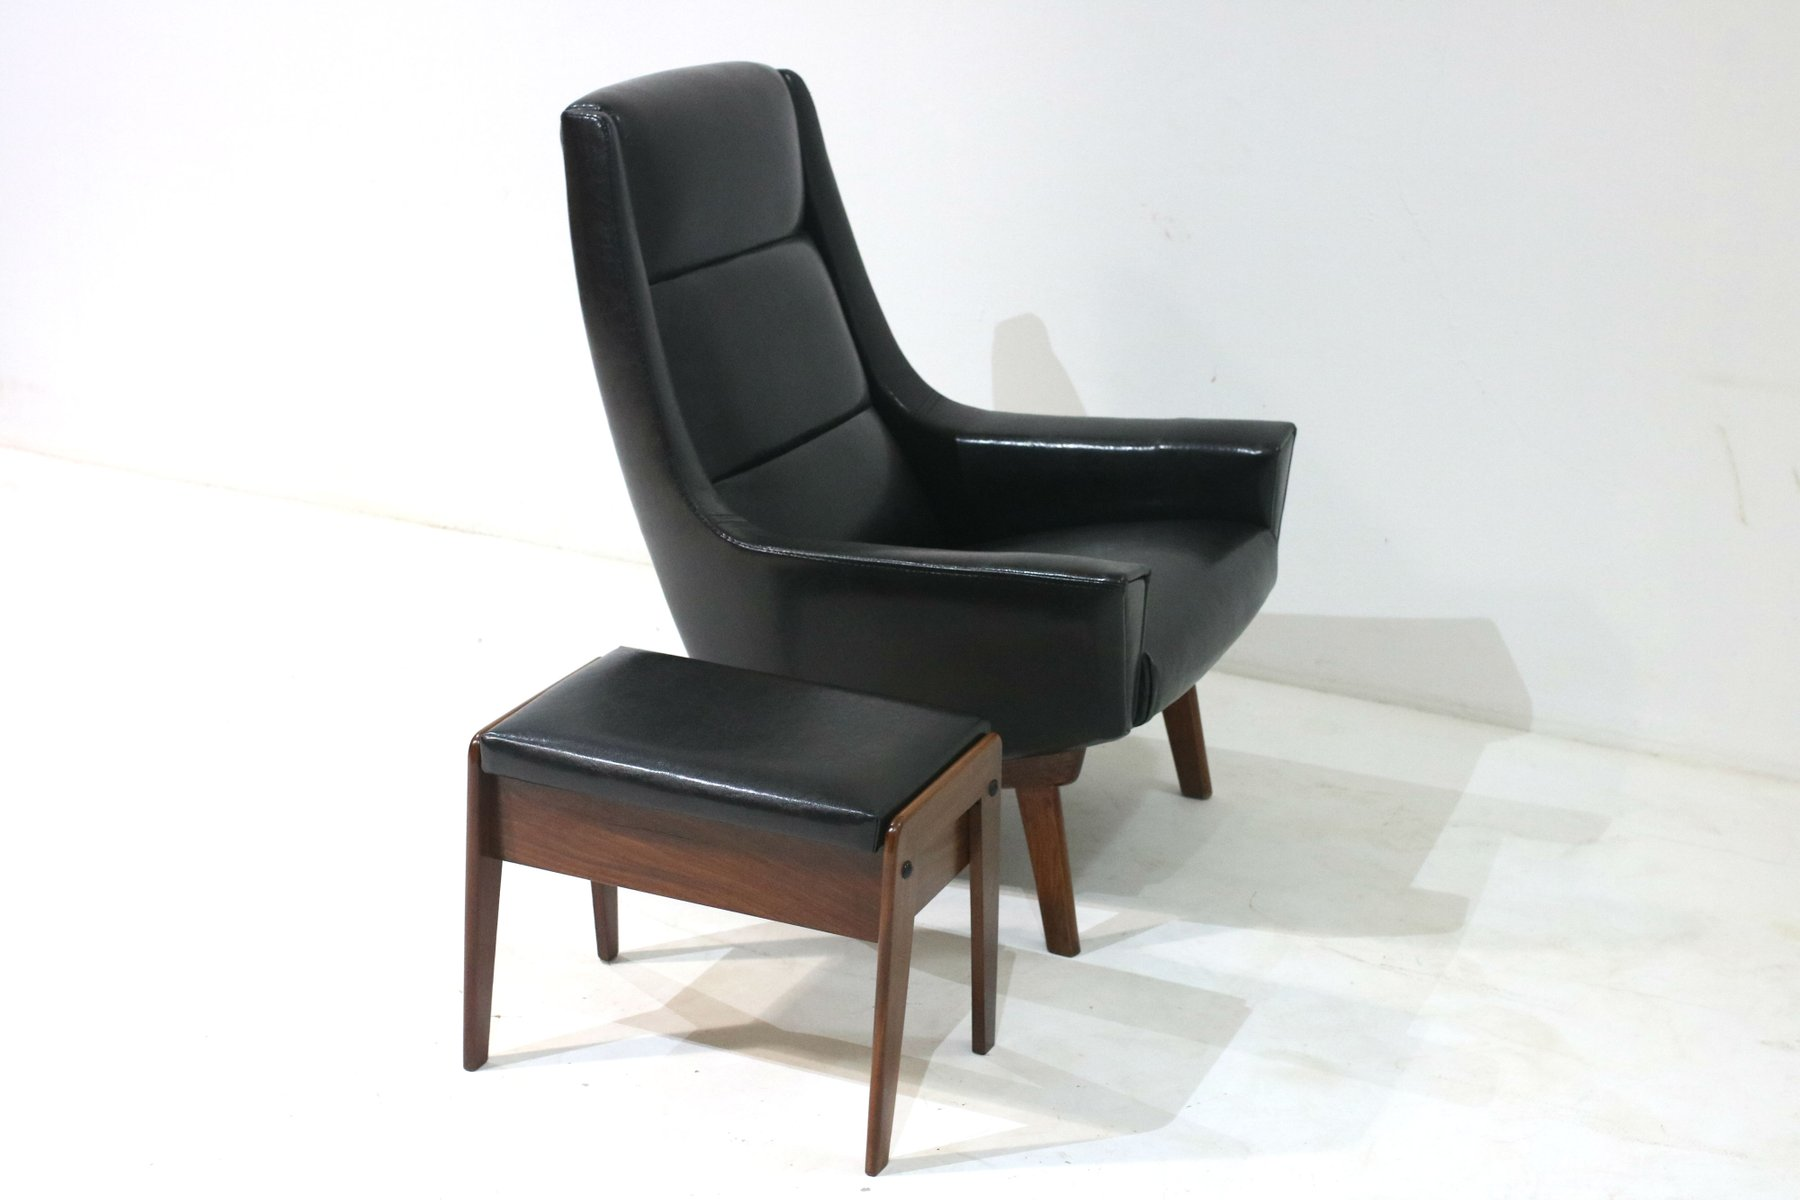 d nischer sessel hocker 1960er bei pamono kaufen. Black Bedroom Furniture Sets. Home Design Ideas